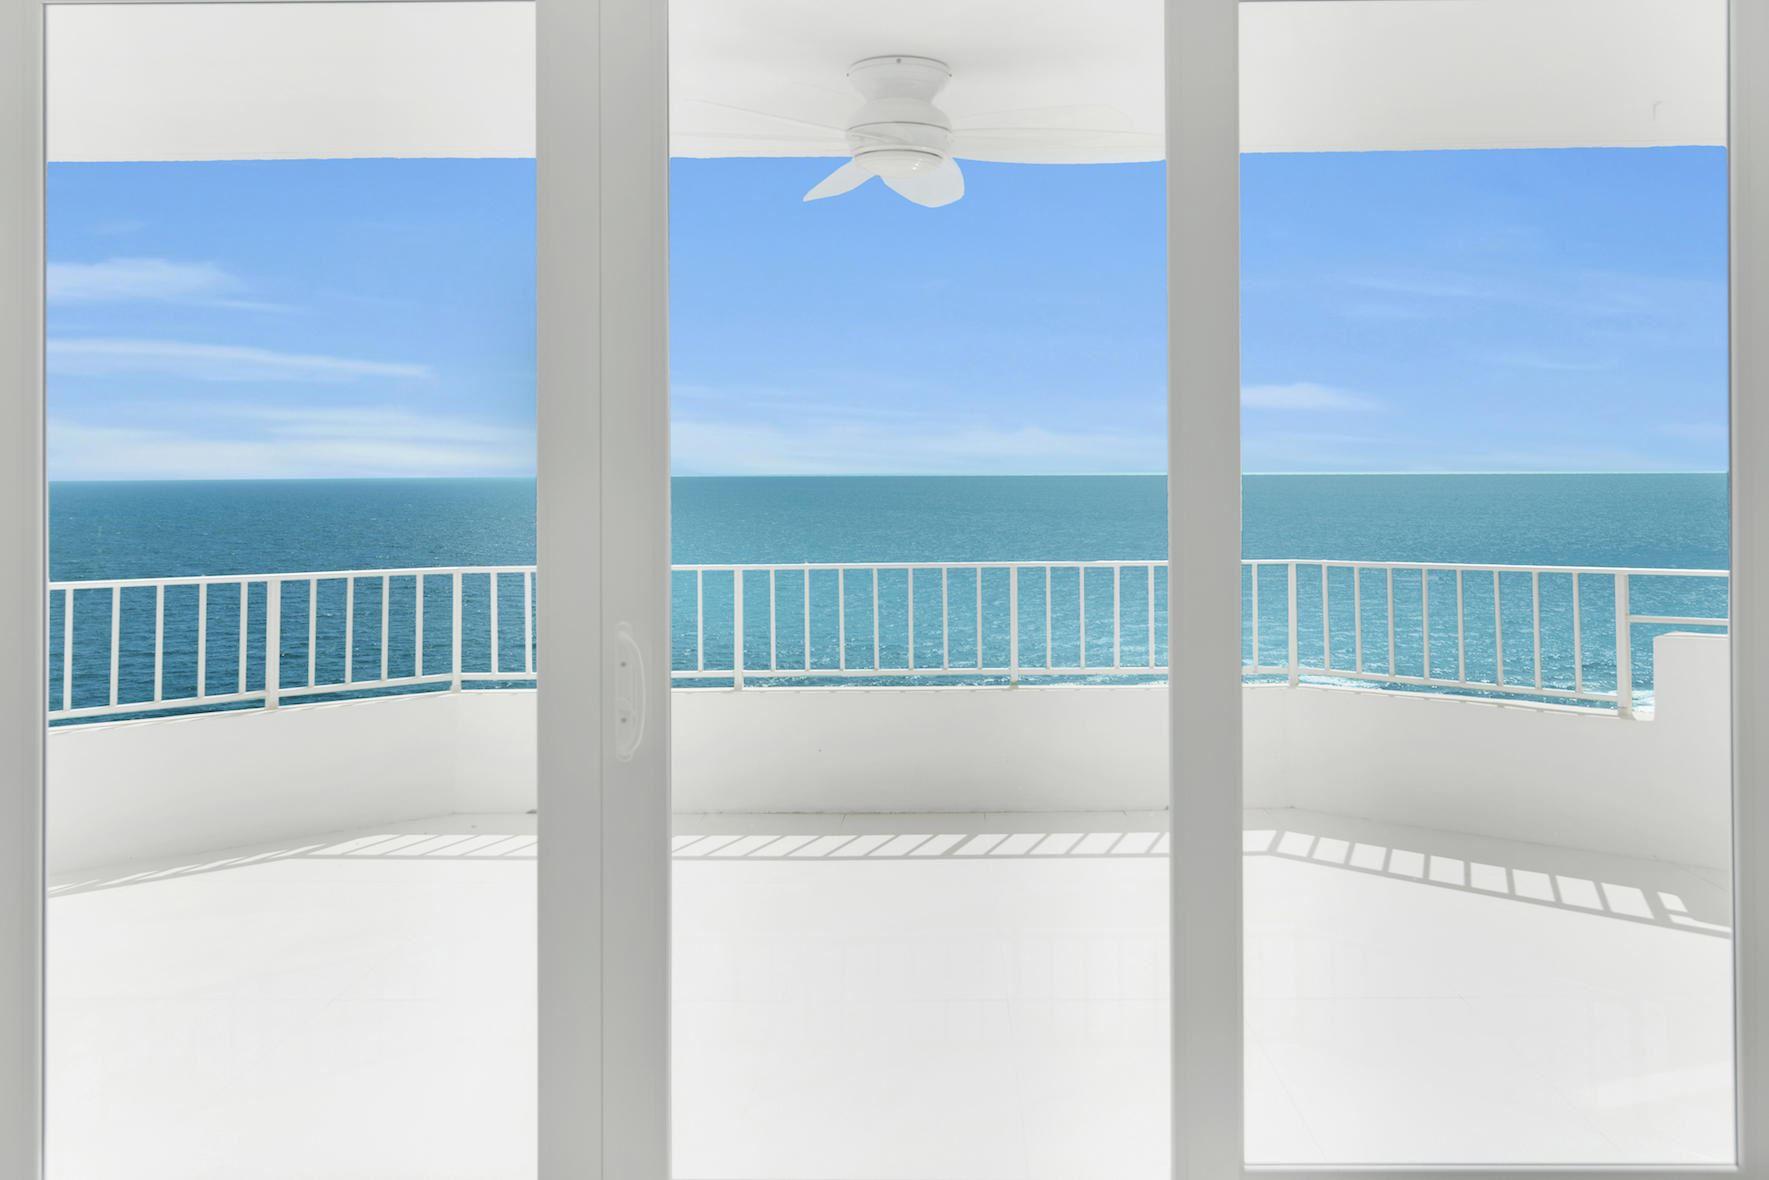 Photo of 550 S Ocean Boulevard #1406-1408, Boca Raton, FL 33432 (MLS # RX-10667616)